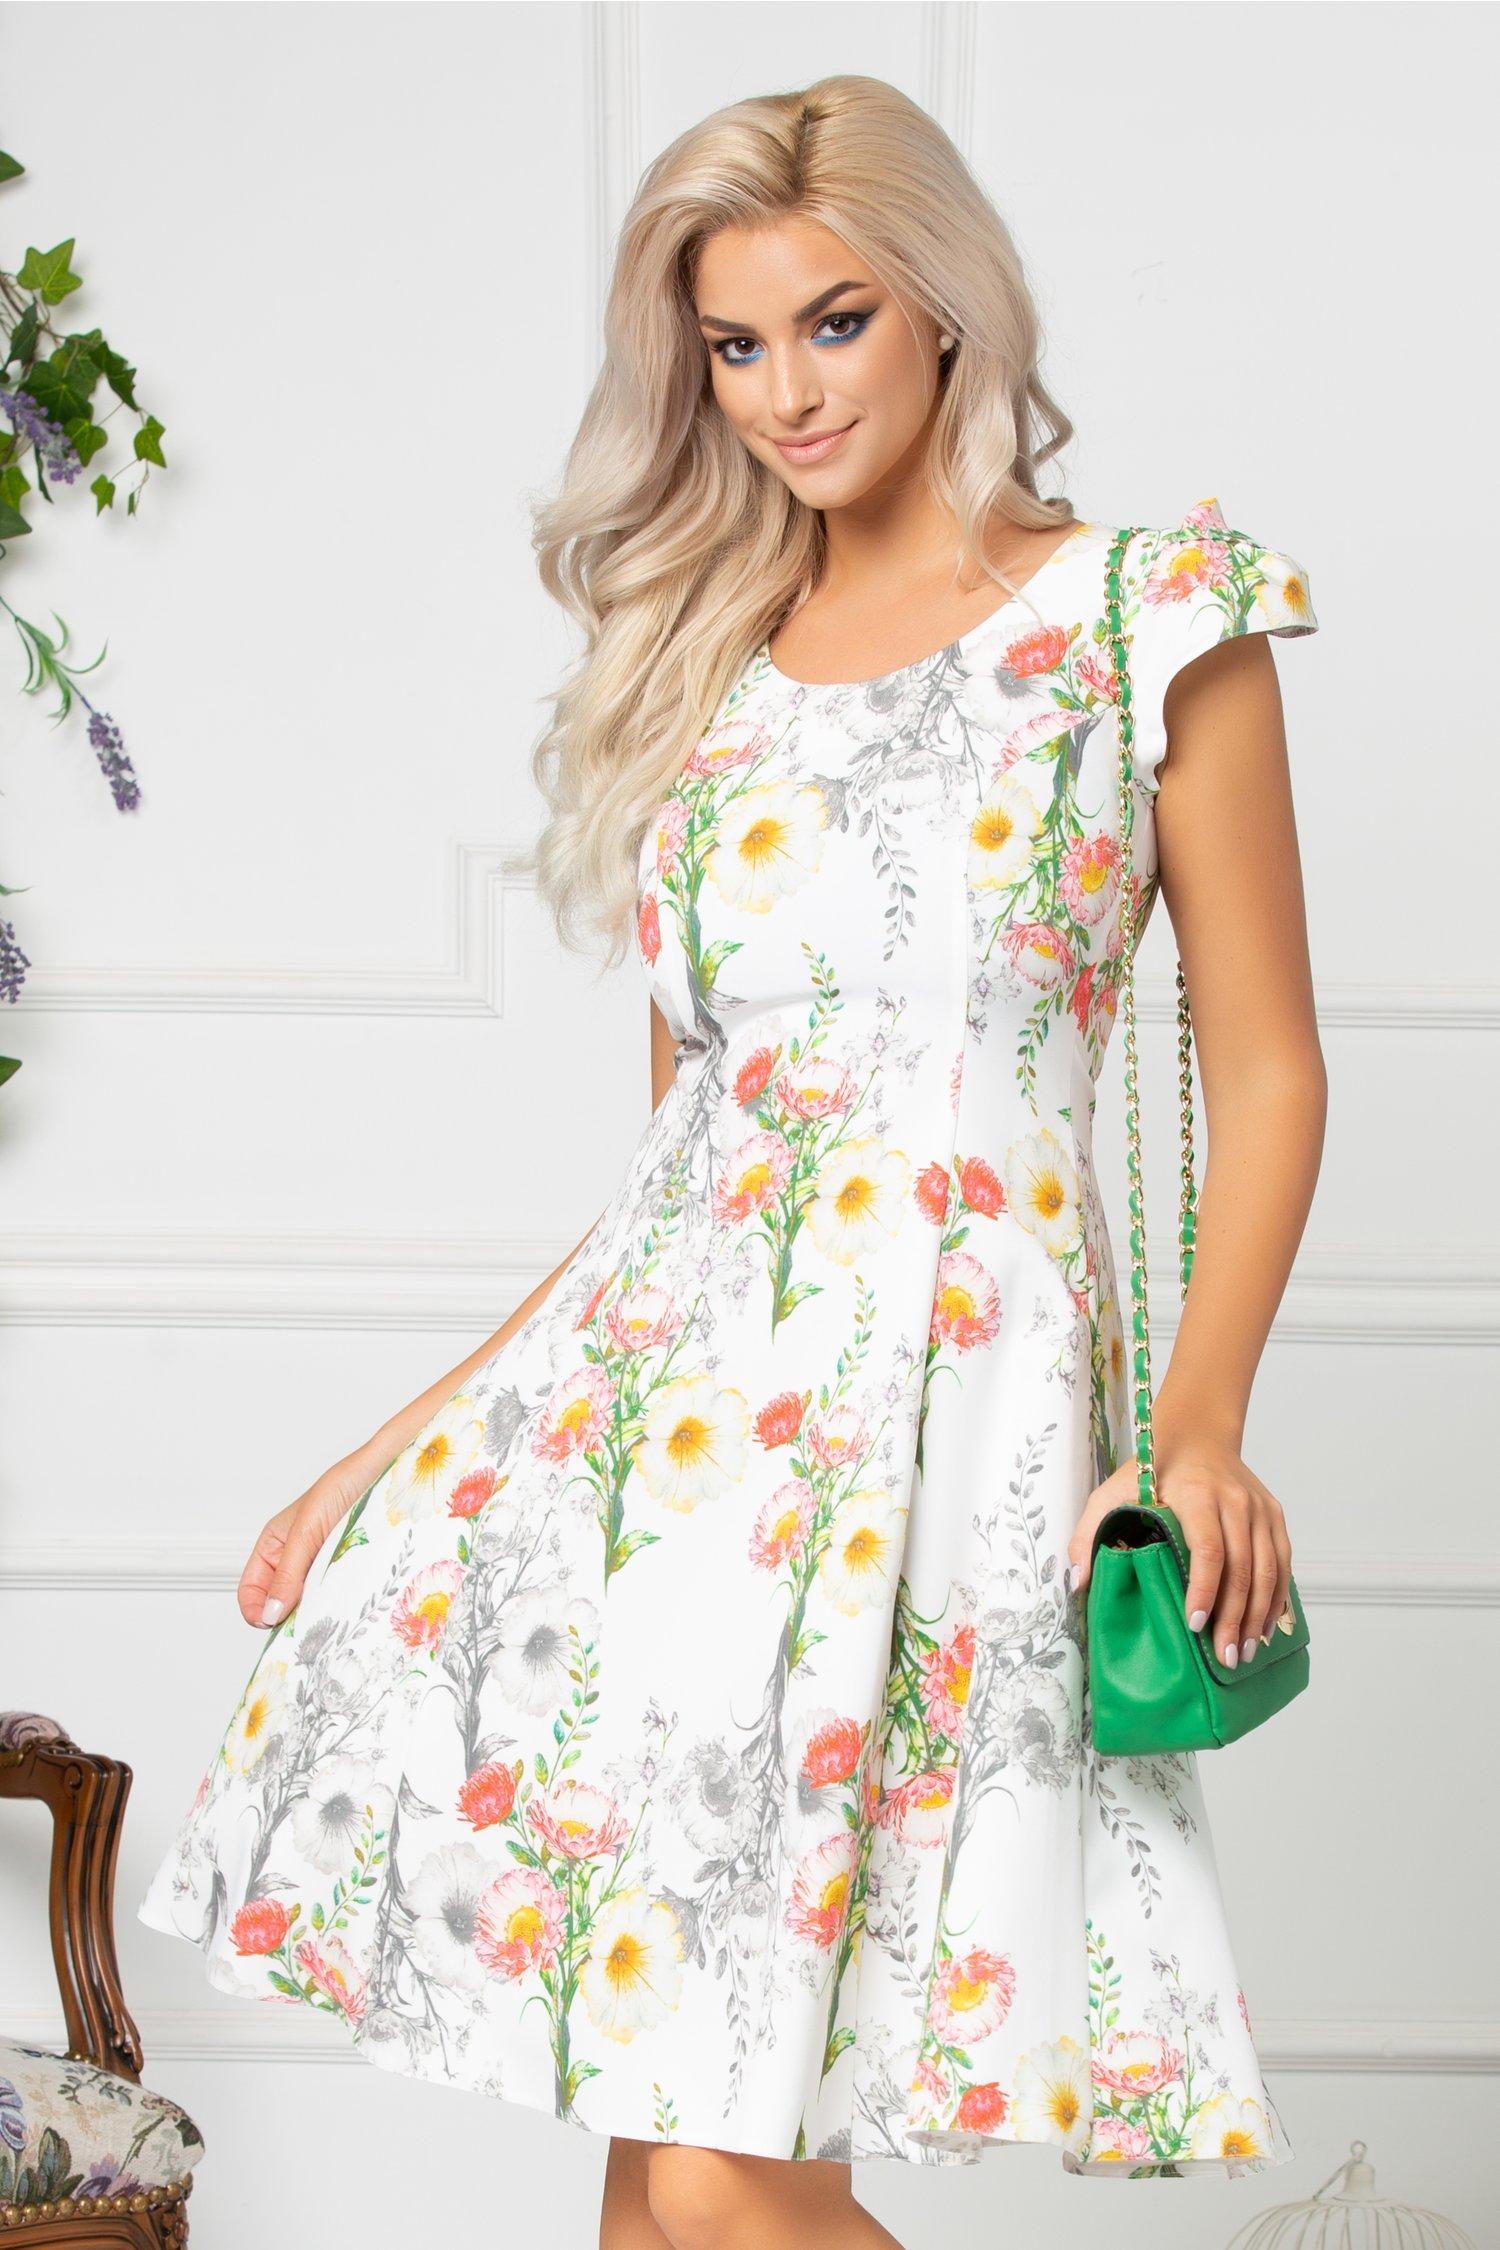 Rochie Aliona alba de zi cu imprimeu floral colorat